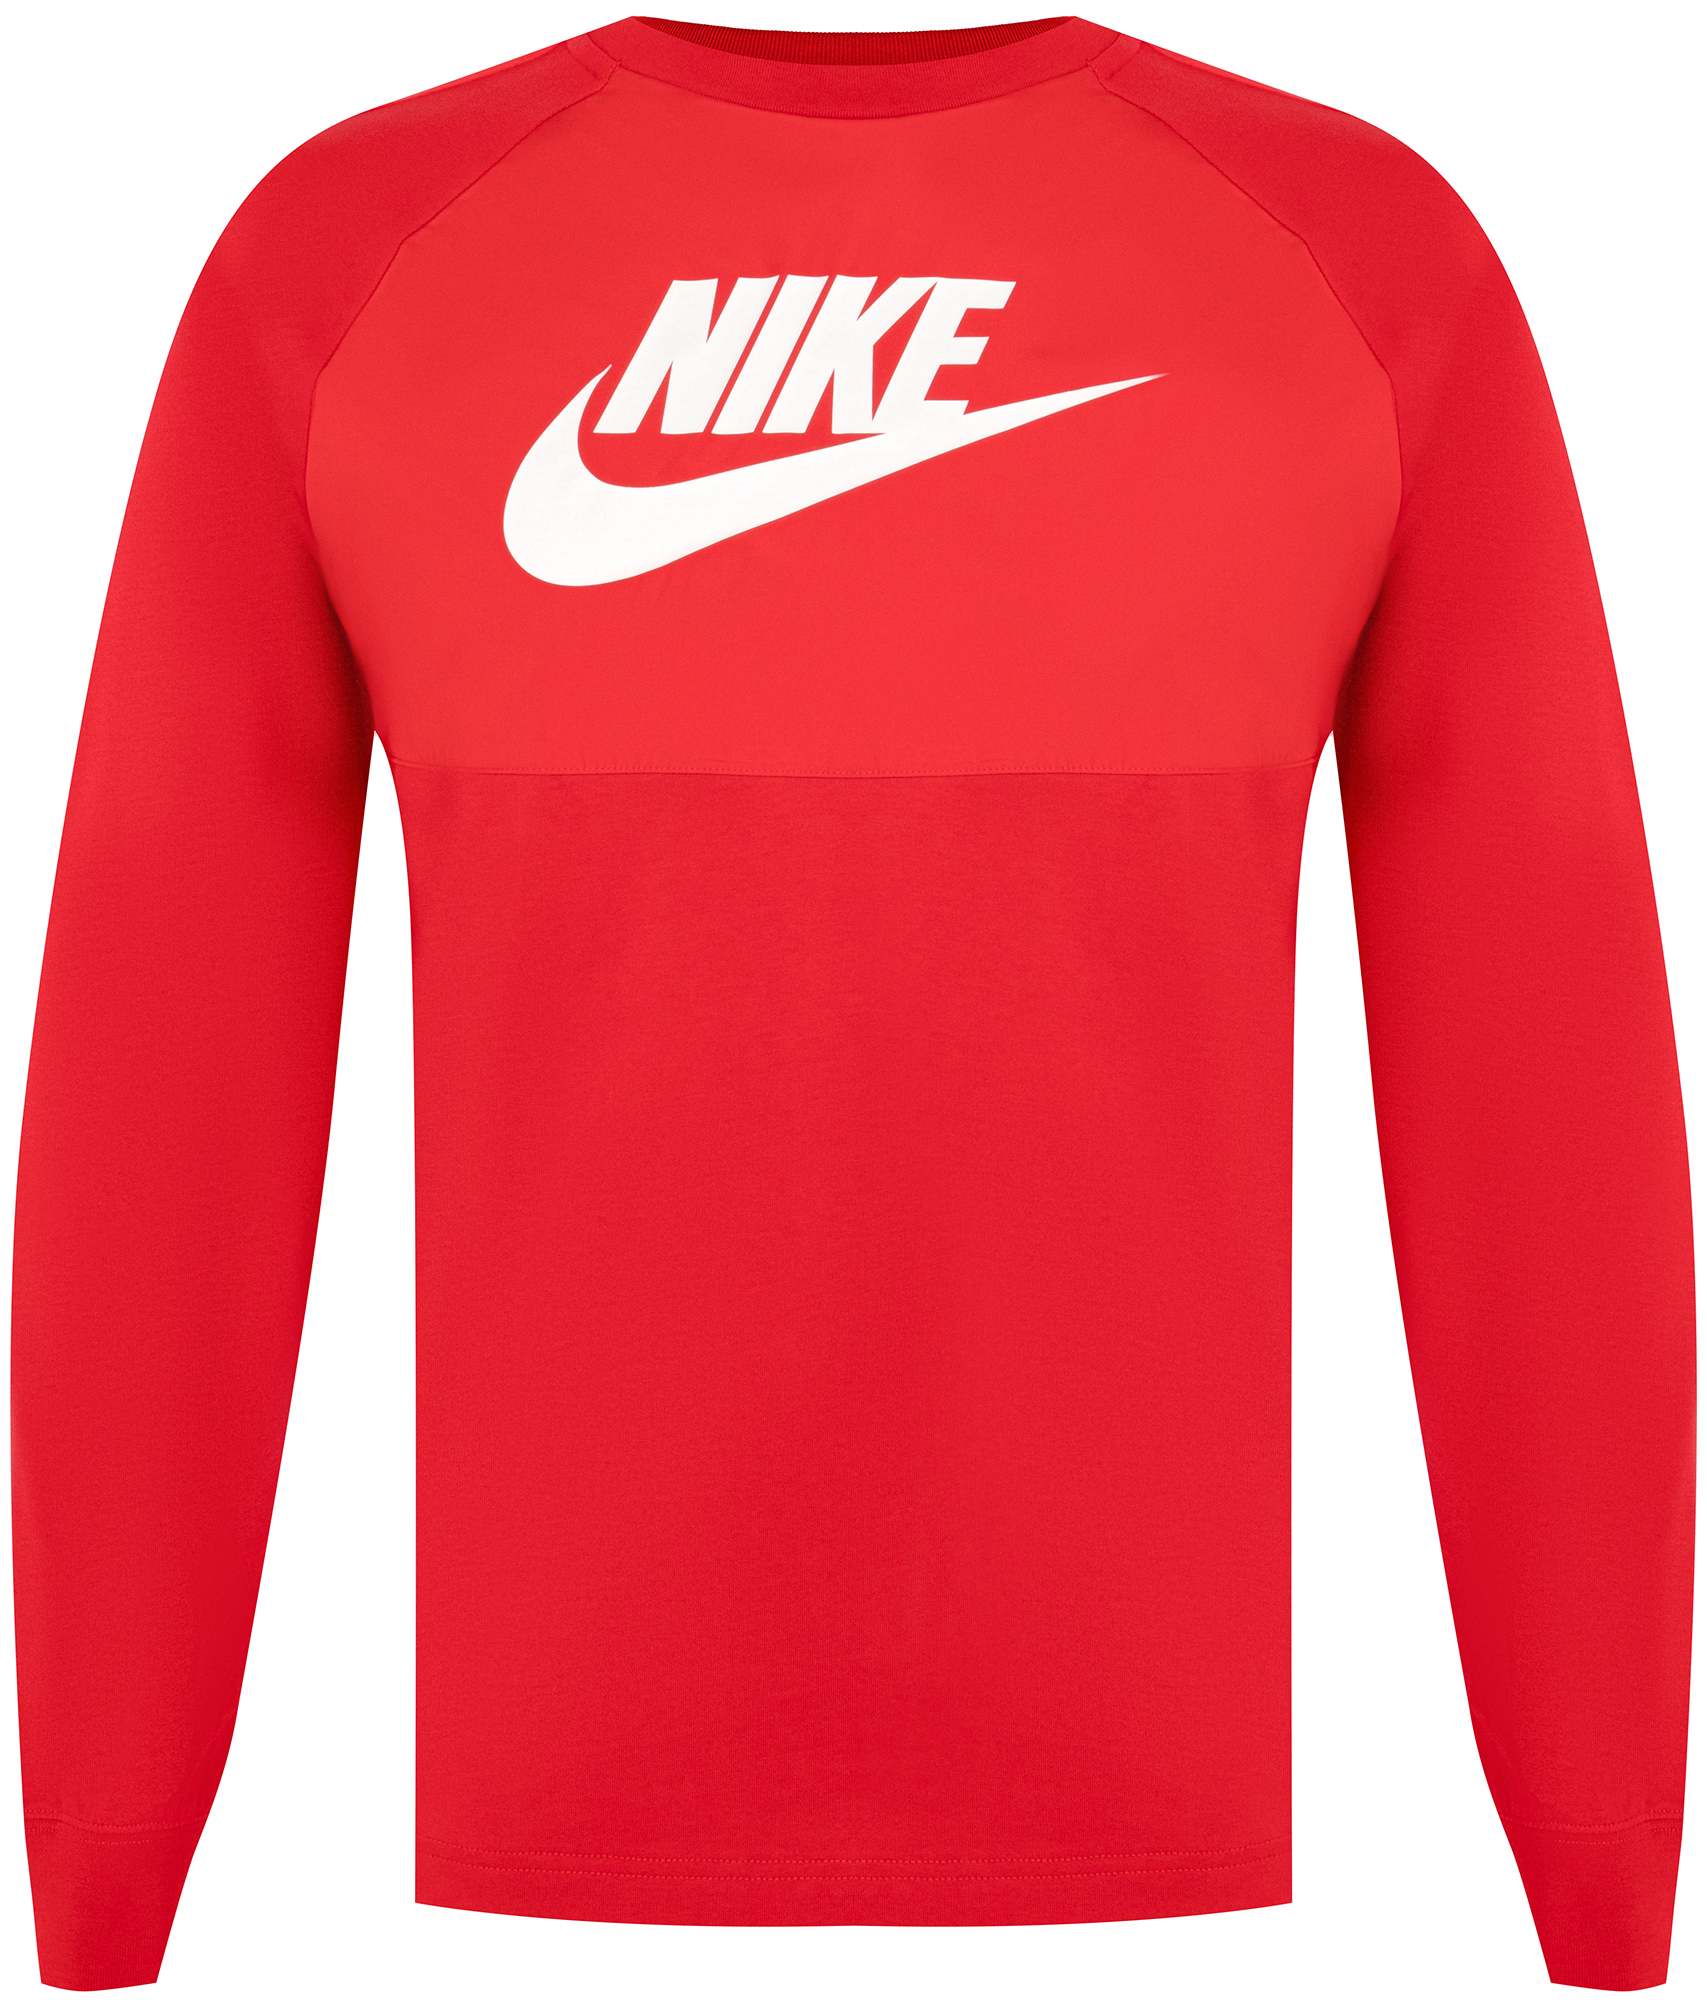 Фото - Nike Свитшот мужской Nike Hybrid, размер 52-54 nike свитшот мужской nike sportswear just do it размер 52 54